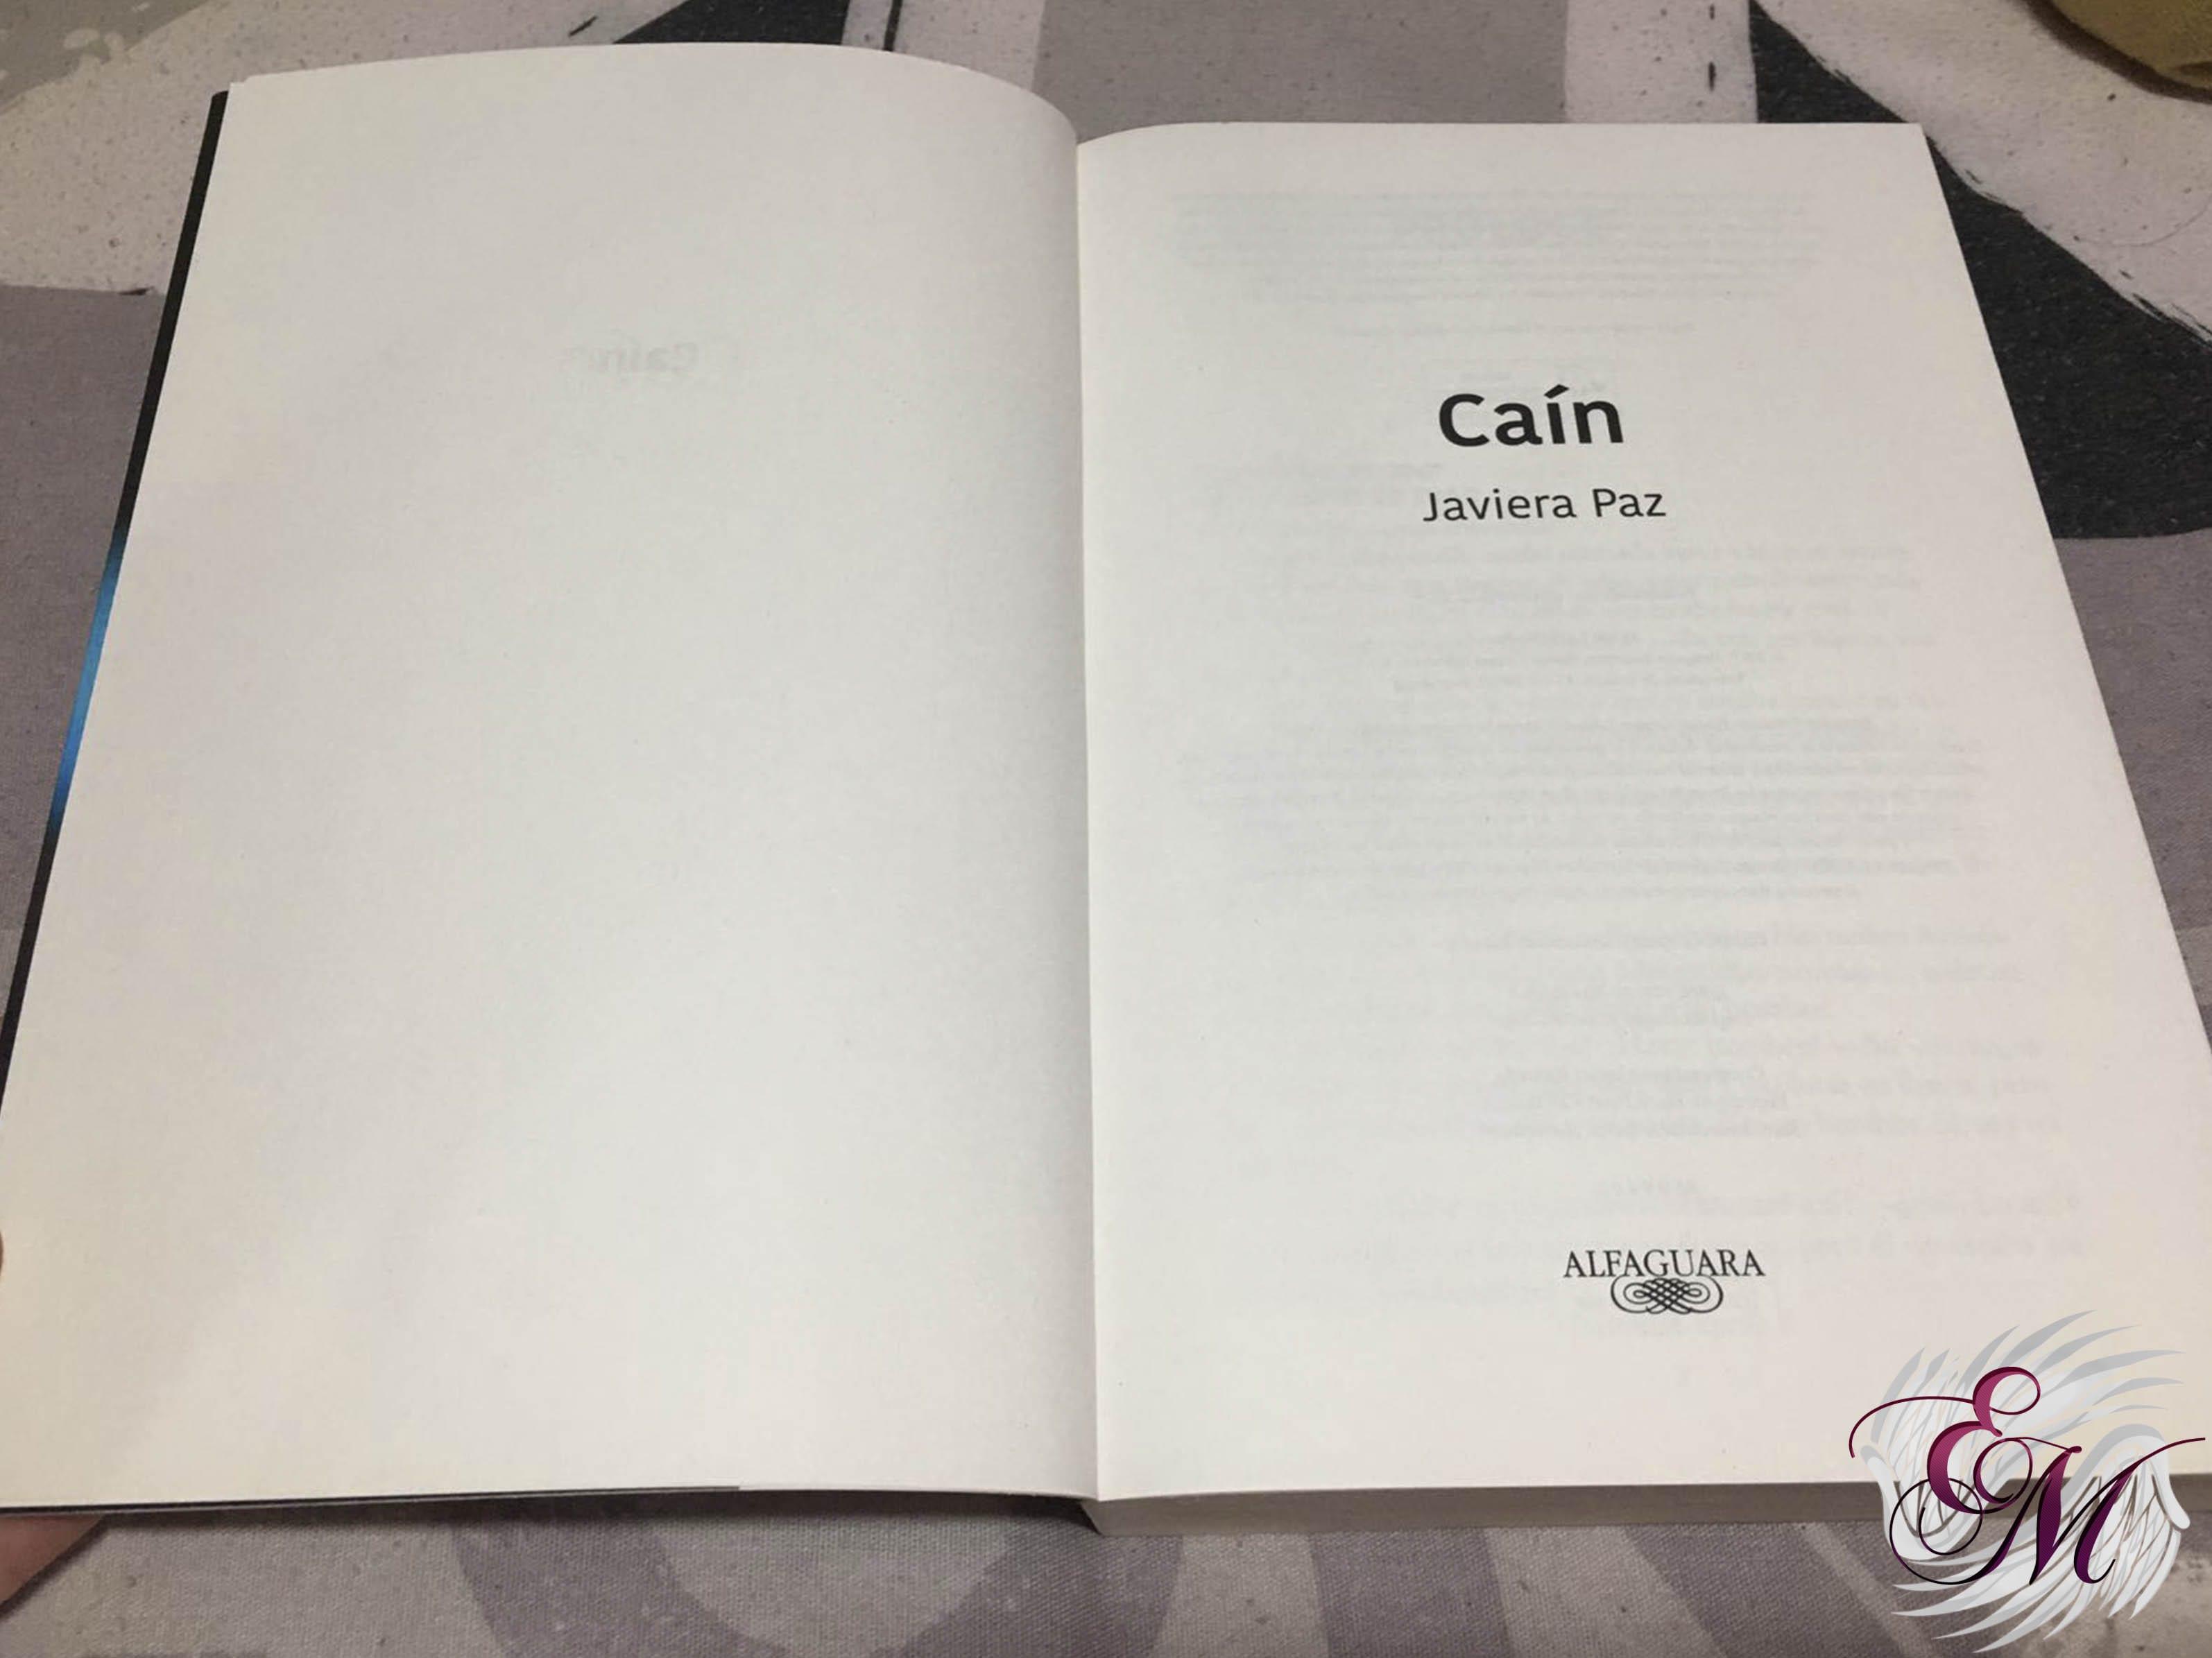 Caín, de Javiera Paz - Reseña